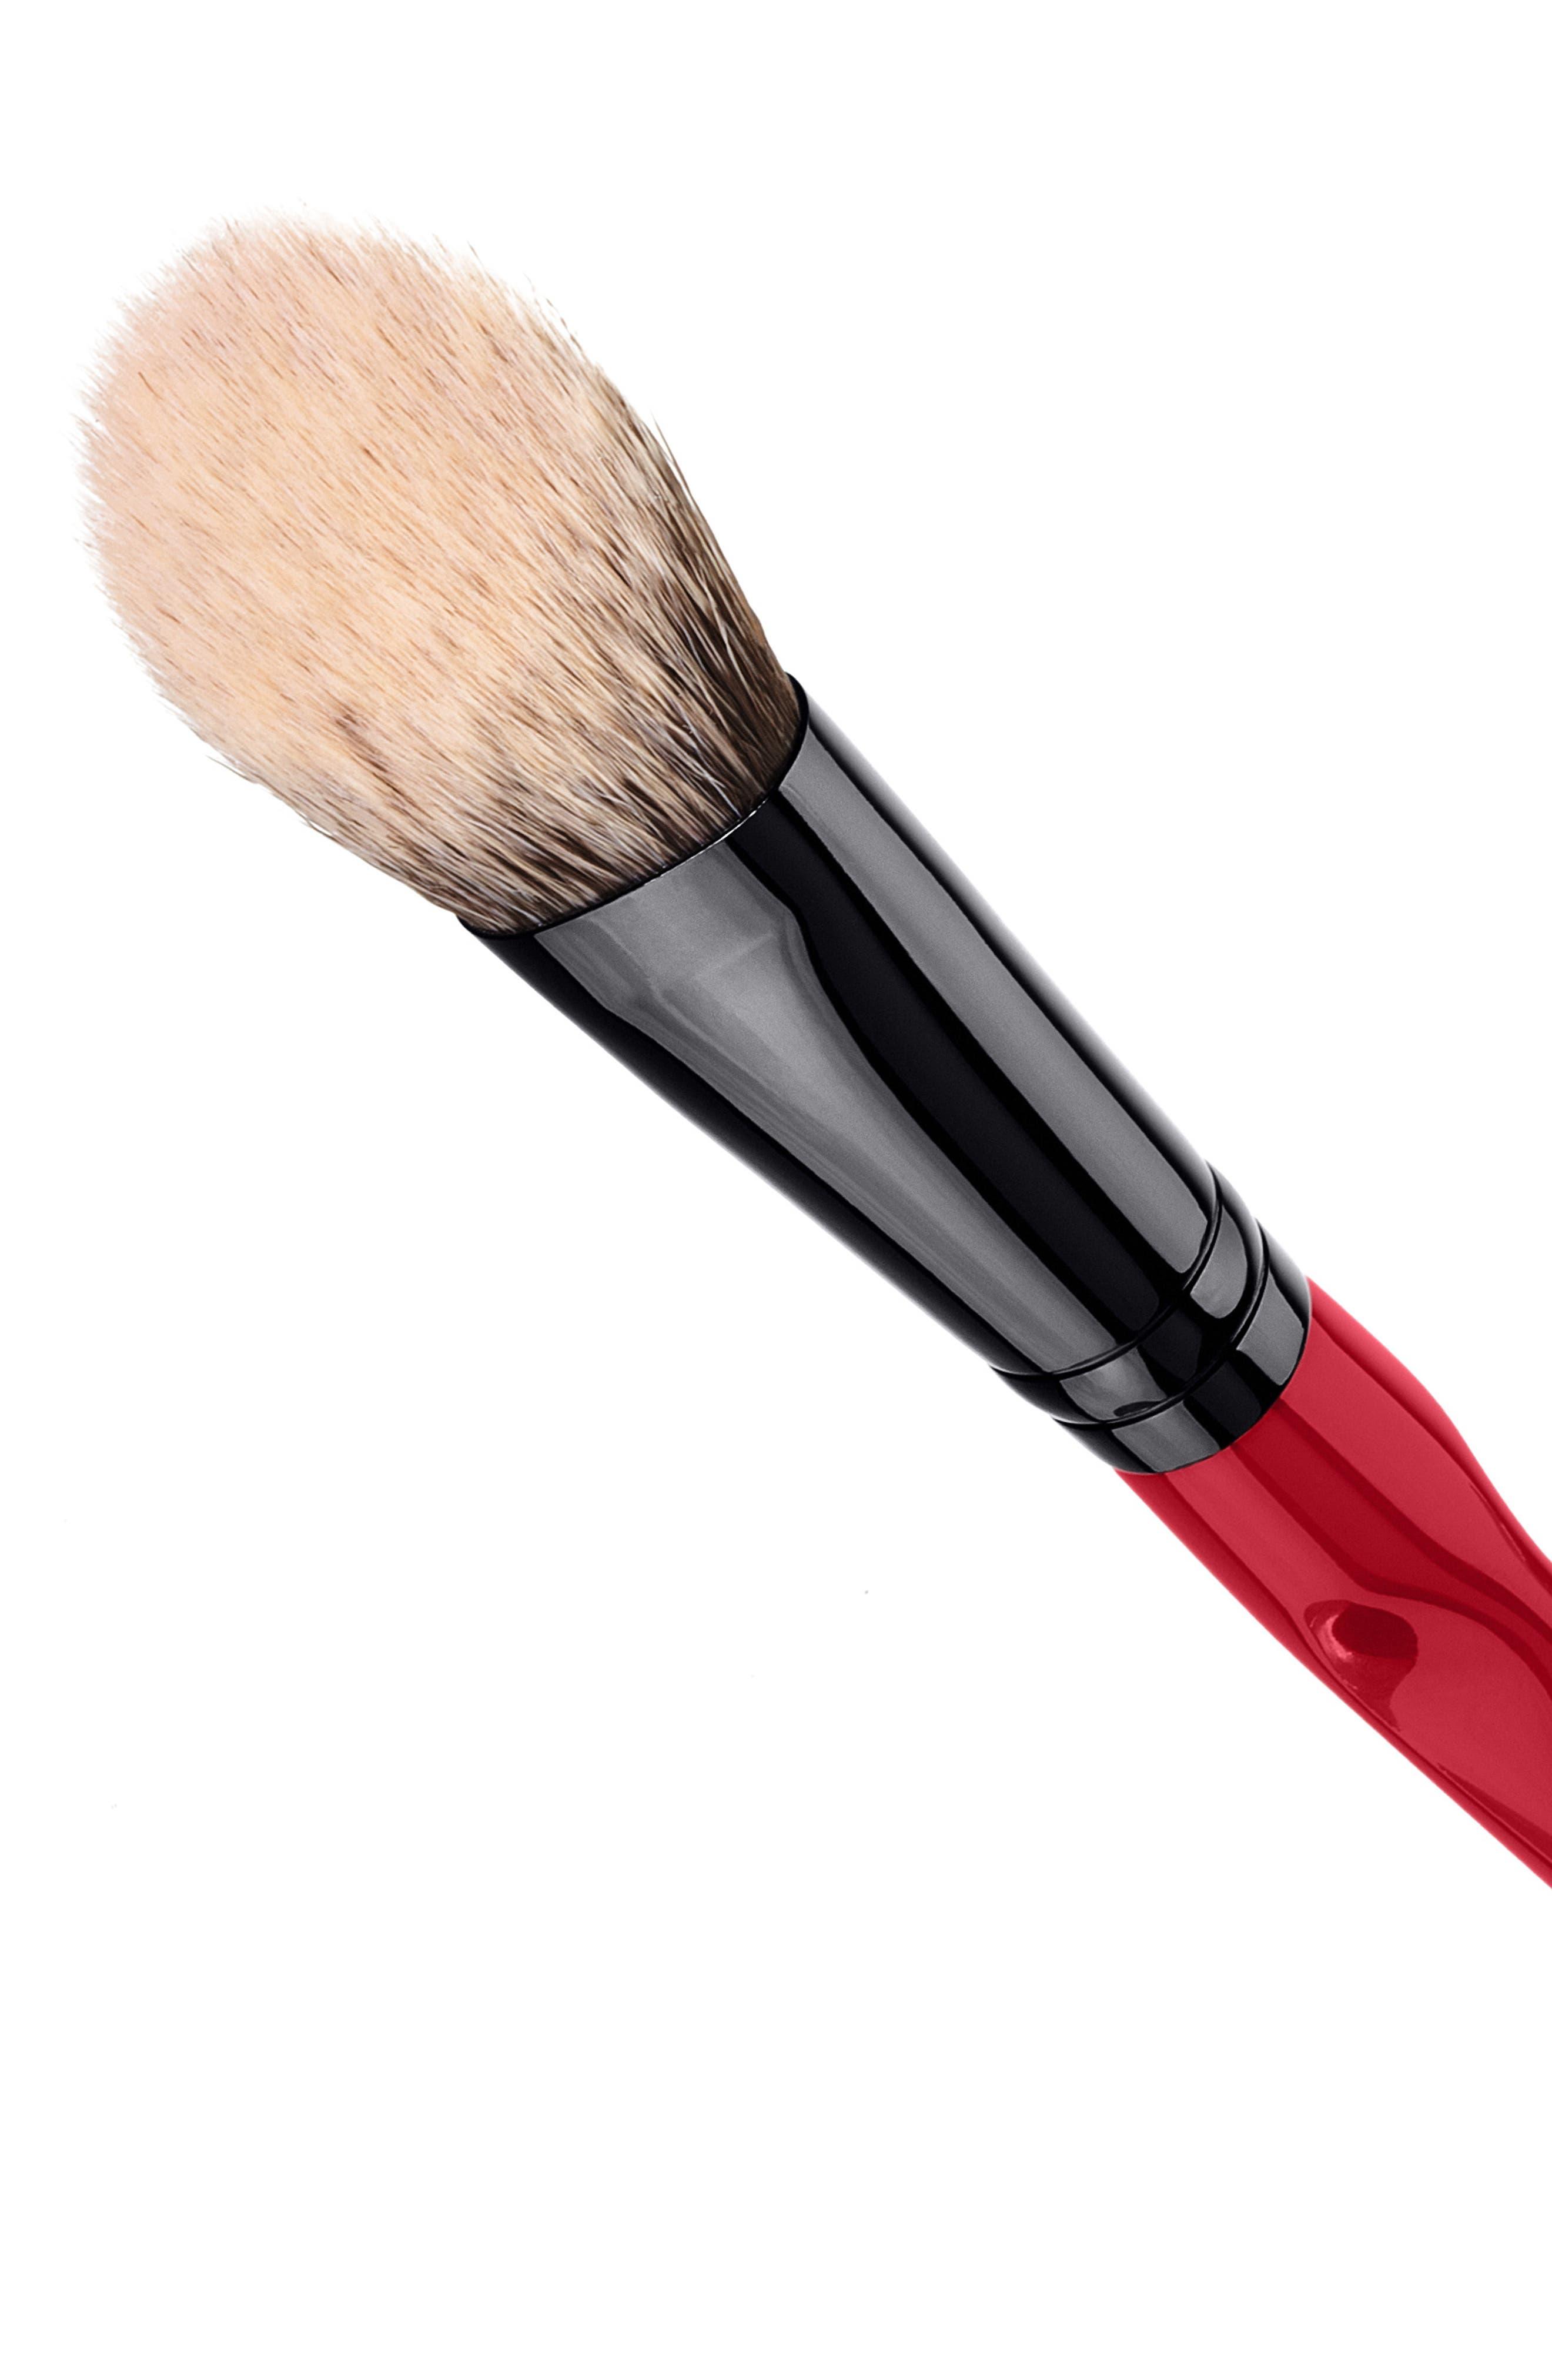 Angled Powder Brush,                             Alternate thumbnail 2, color,                             NO COLOR